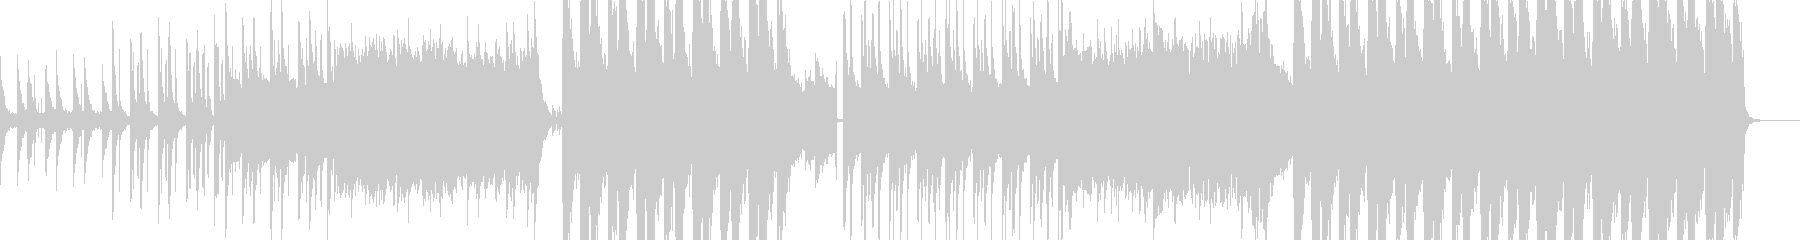 Chainsmokesr風のエモいEDMの未再生の波形